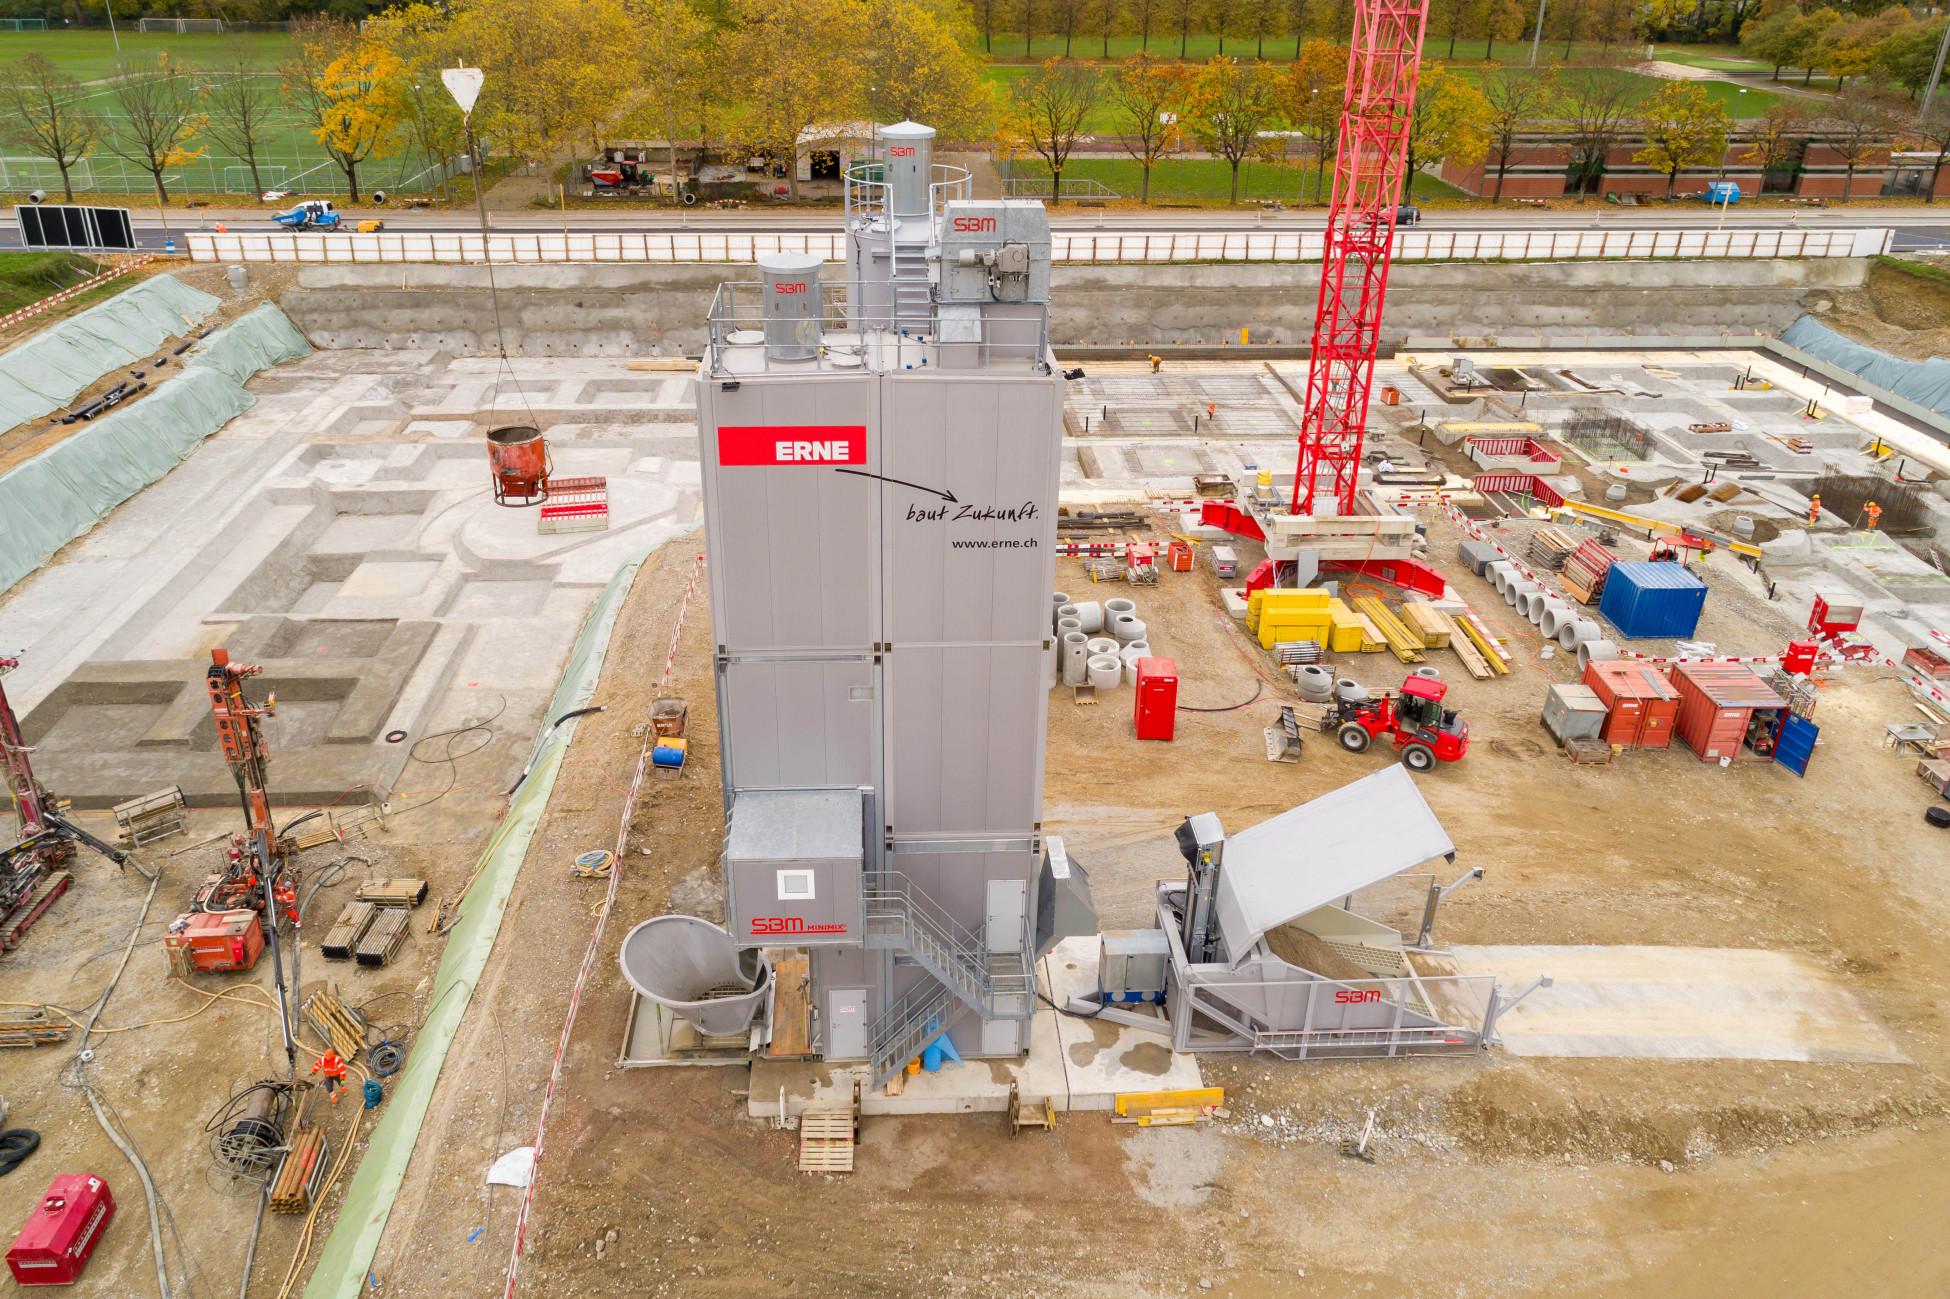 ERNE Maschinenpark mobile Betonanlage Allschwil Neubau GRID